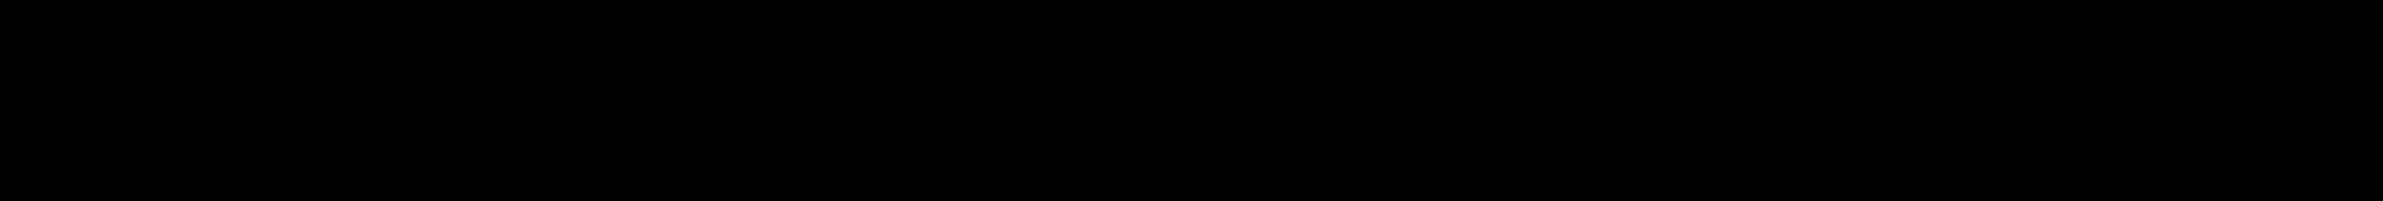 Sol Pro Condensed Bold Italic